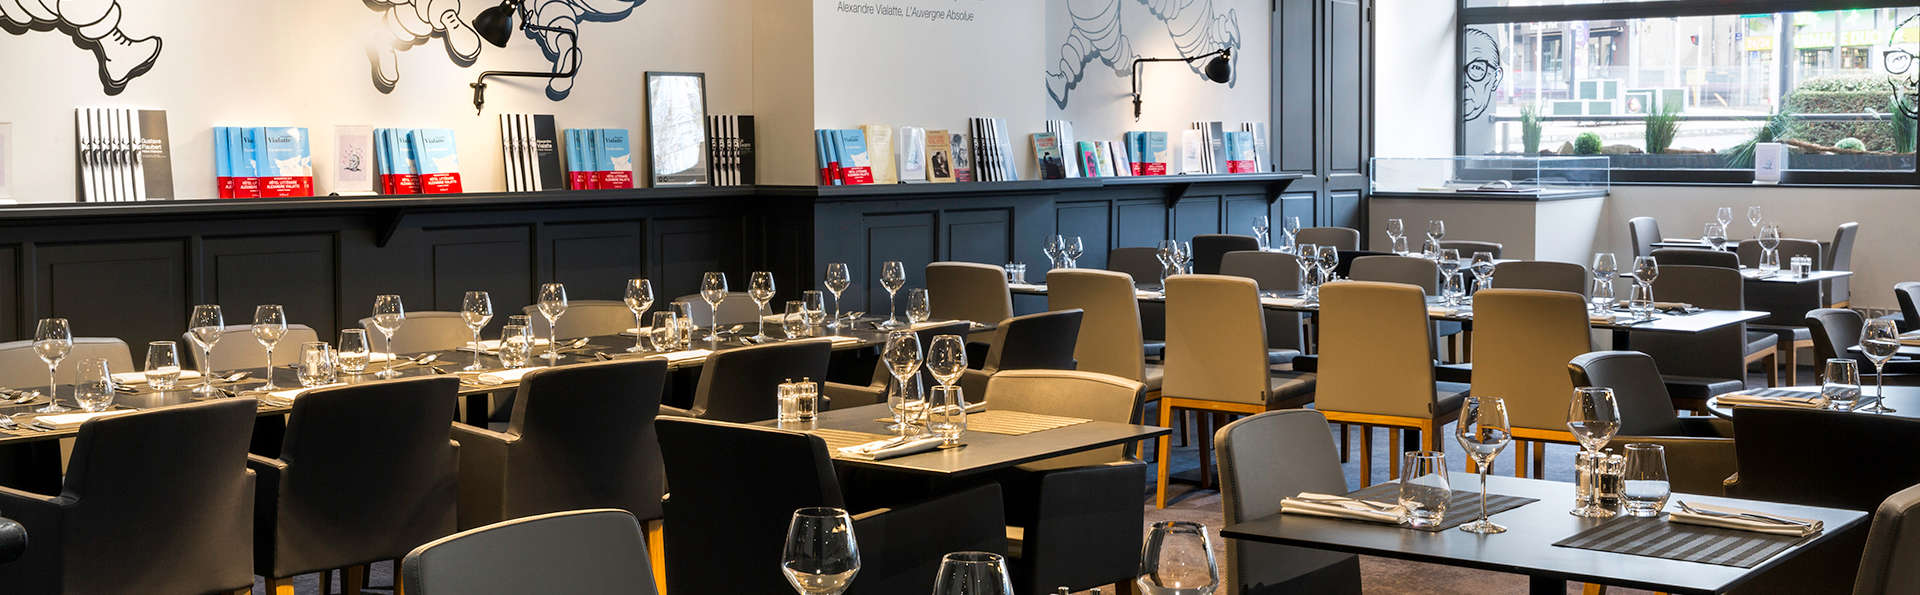 Best Western Plus Hôtel Littéraire Alexandre Vialatte - EDIT_restaurant4.jpg